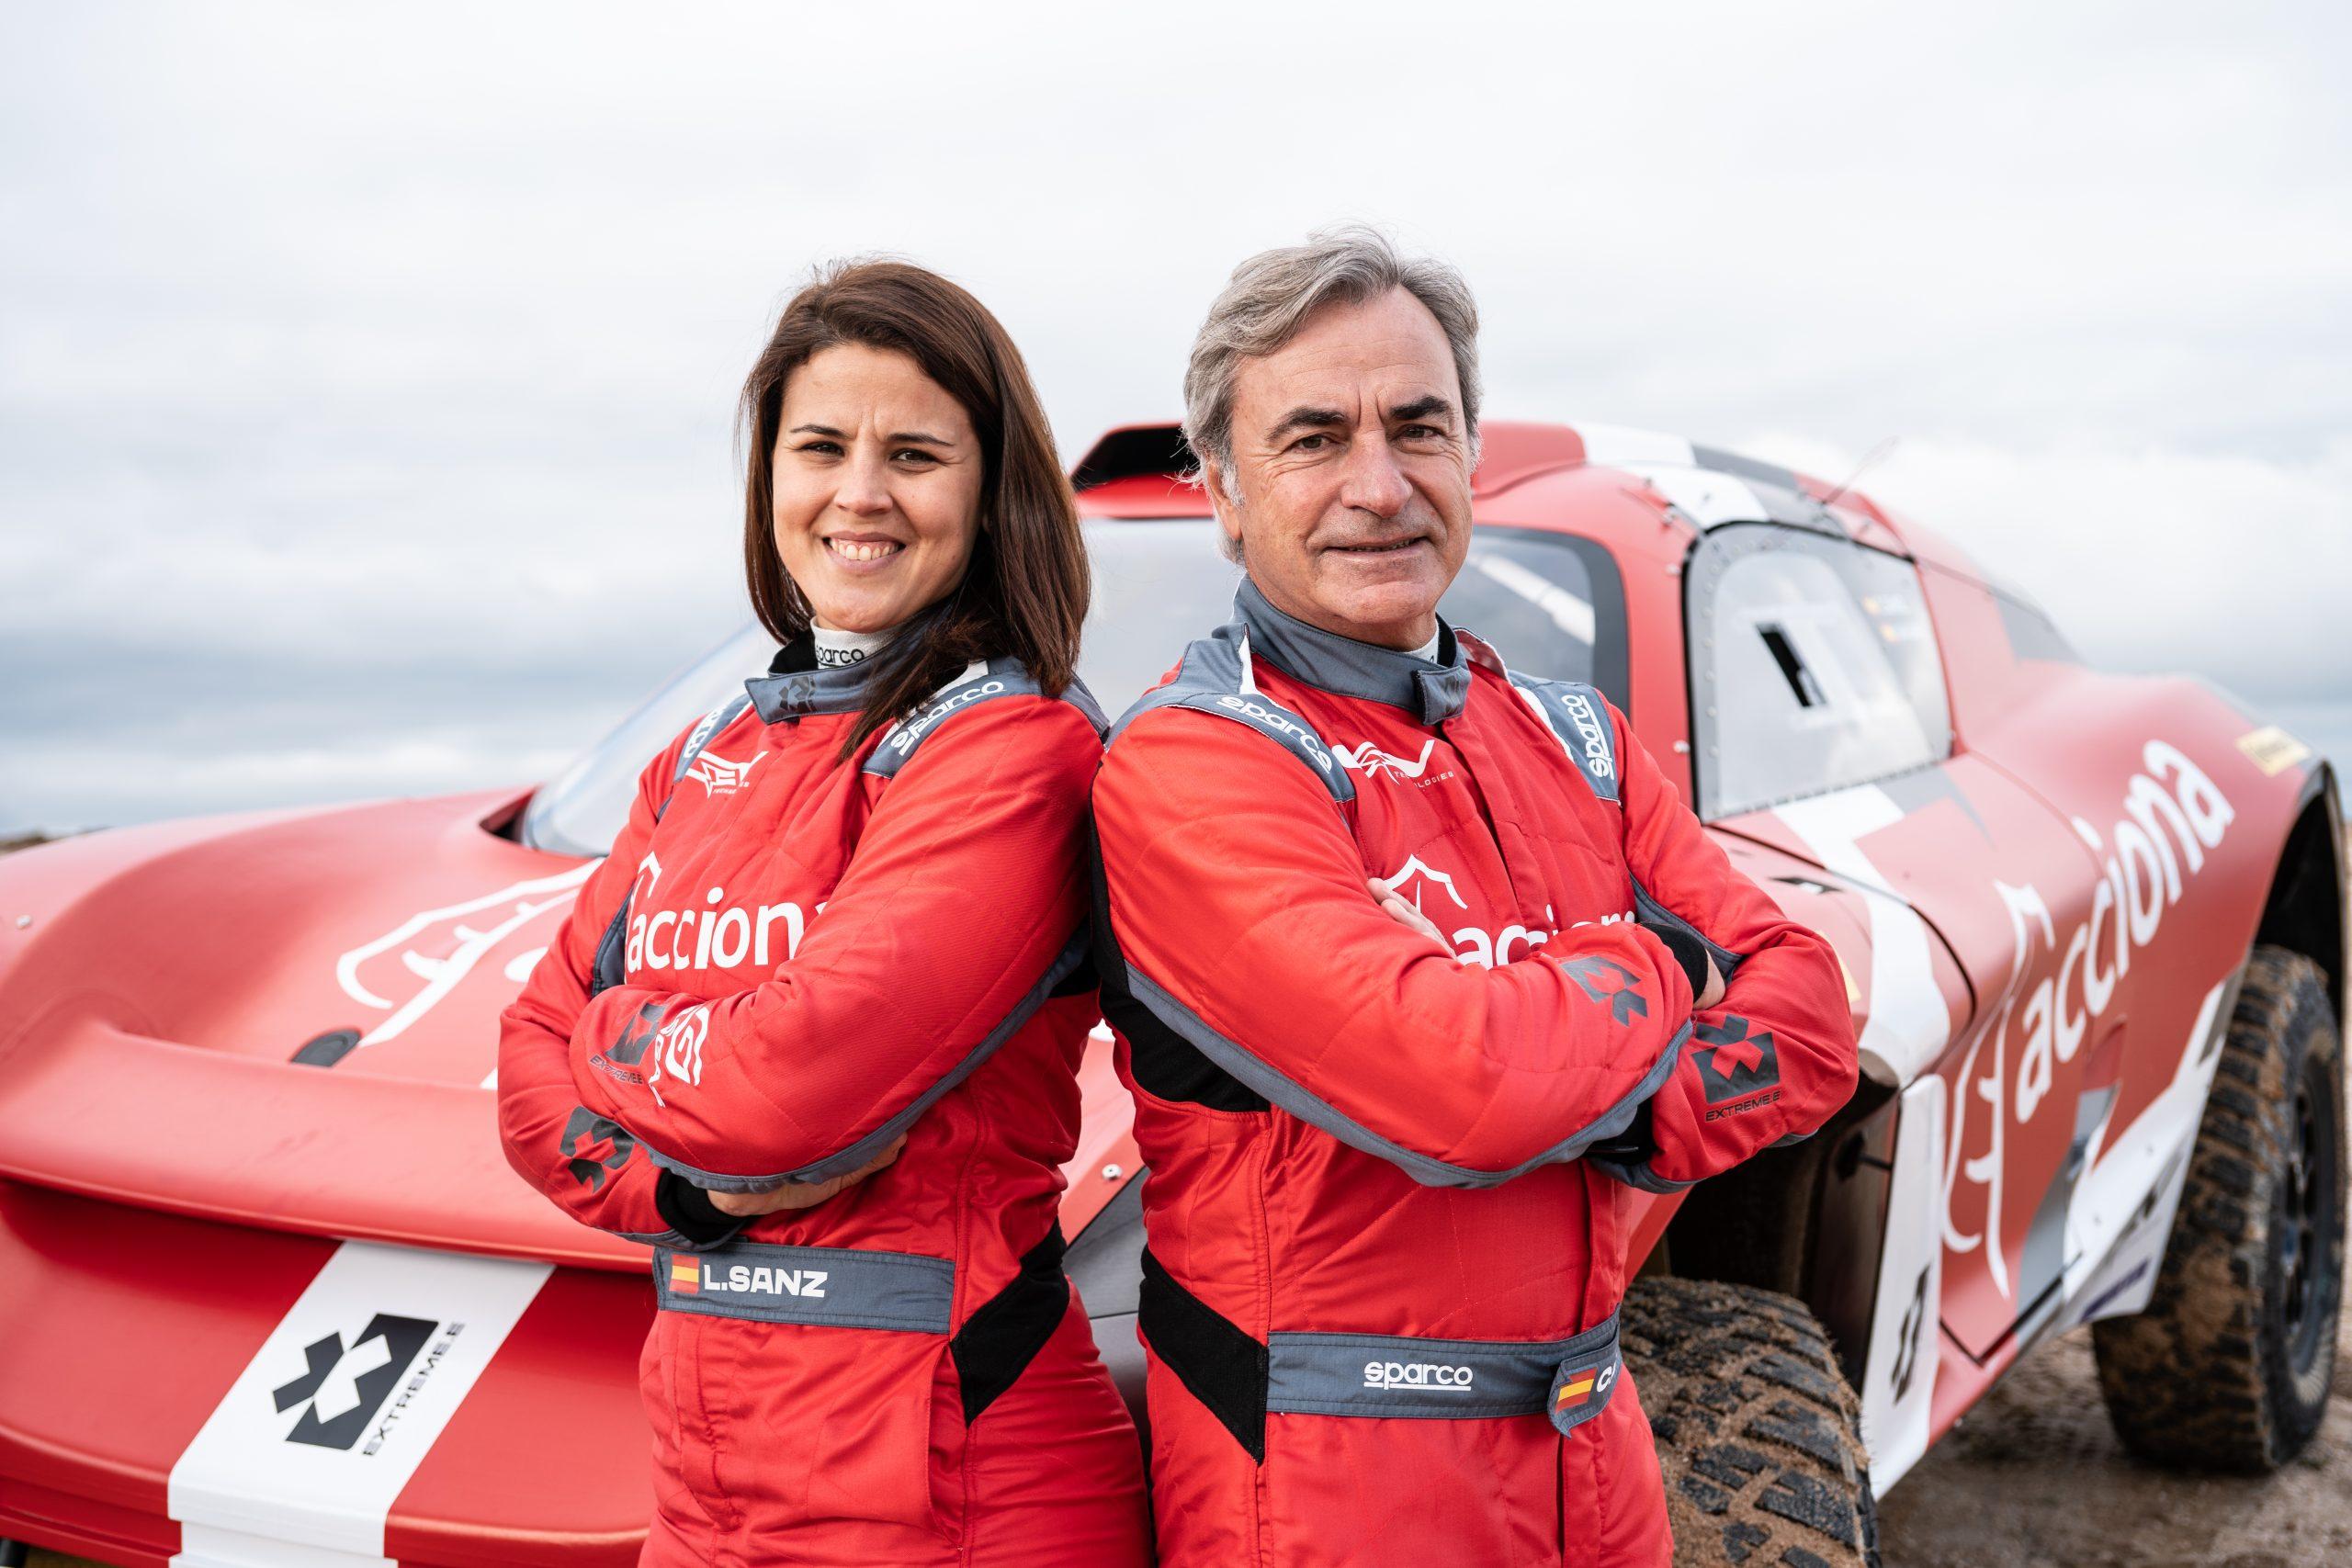 ACCIONA,卡洛斯·塞恩斯和 QEV TECHNOLOGIES组队加盟全新环保SUV越野赛EXTREME E, QEV